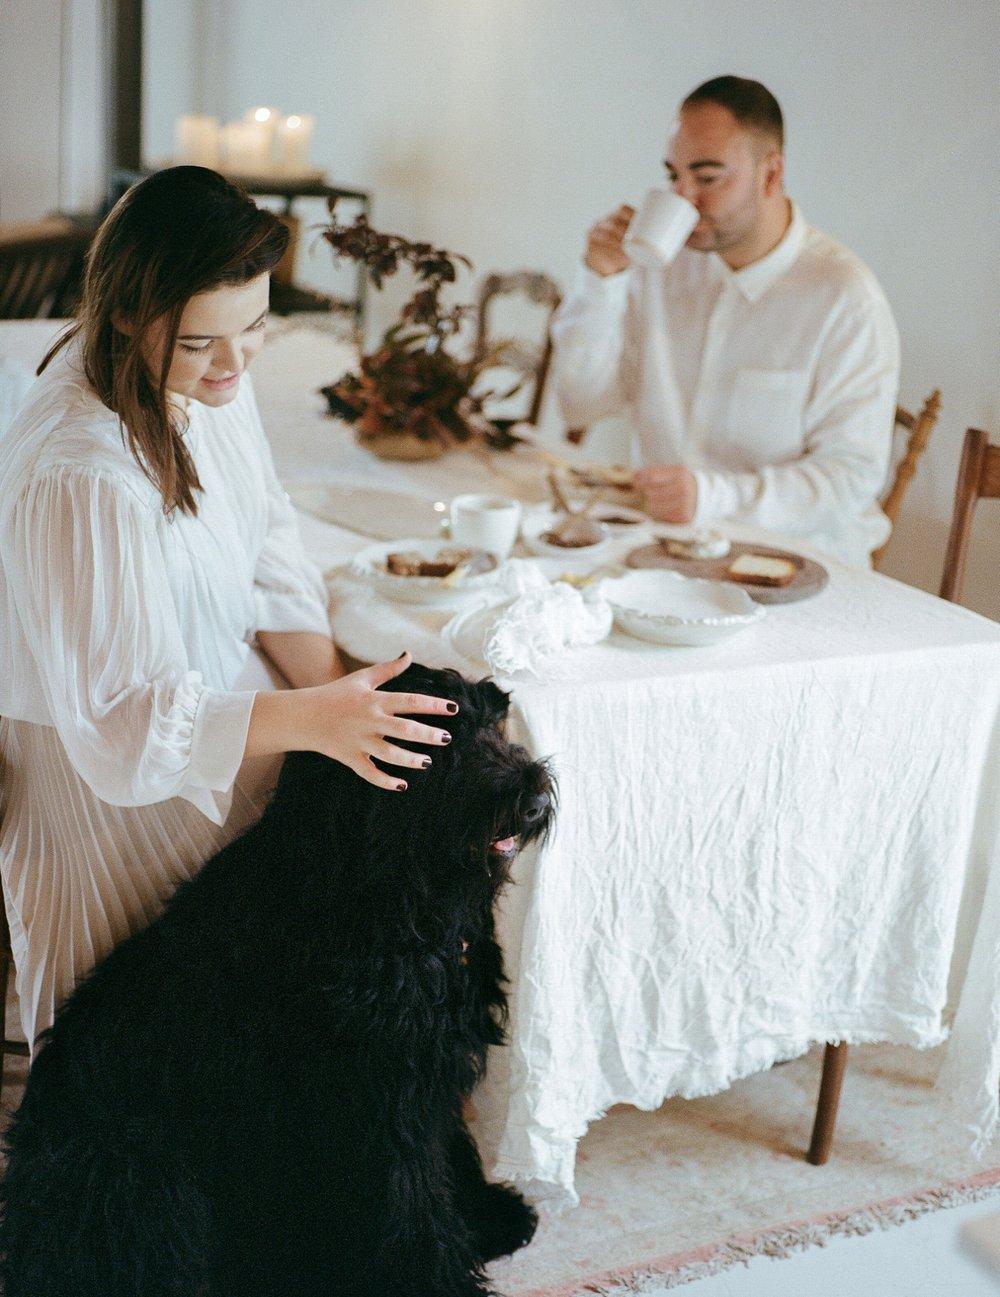 dehan-engelbrecht-scandinavian-wedding-film-photographer-eduan-roos-melissa-de-villiers-pajamas-and-jam-eatery_0011.jpg